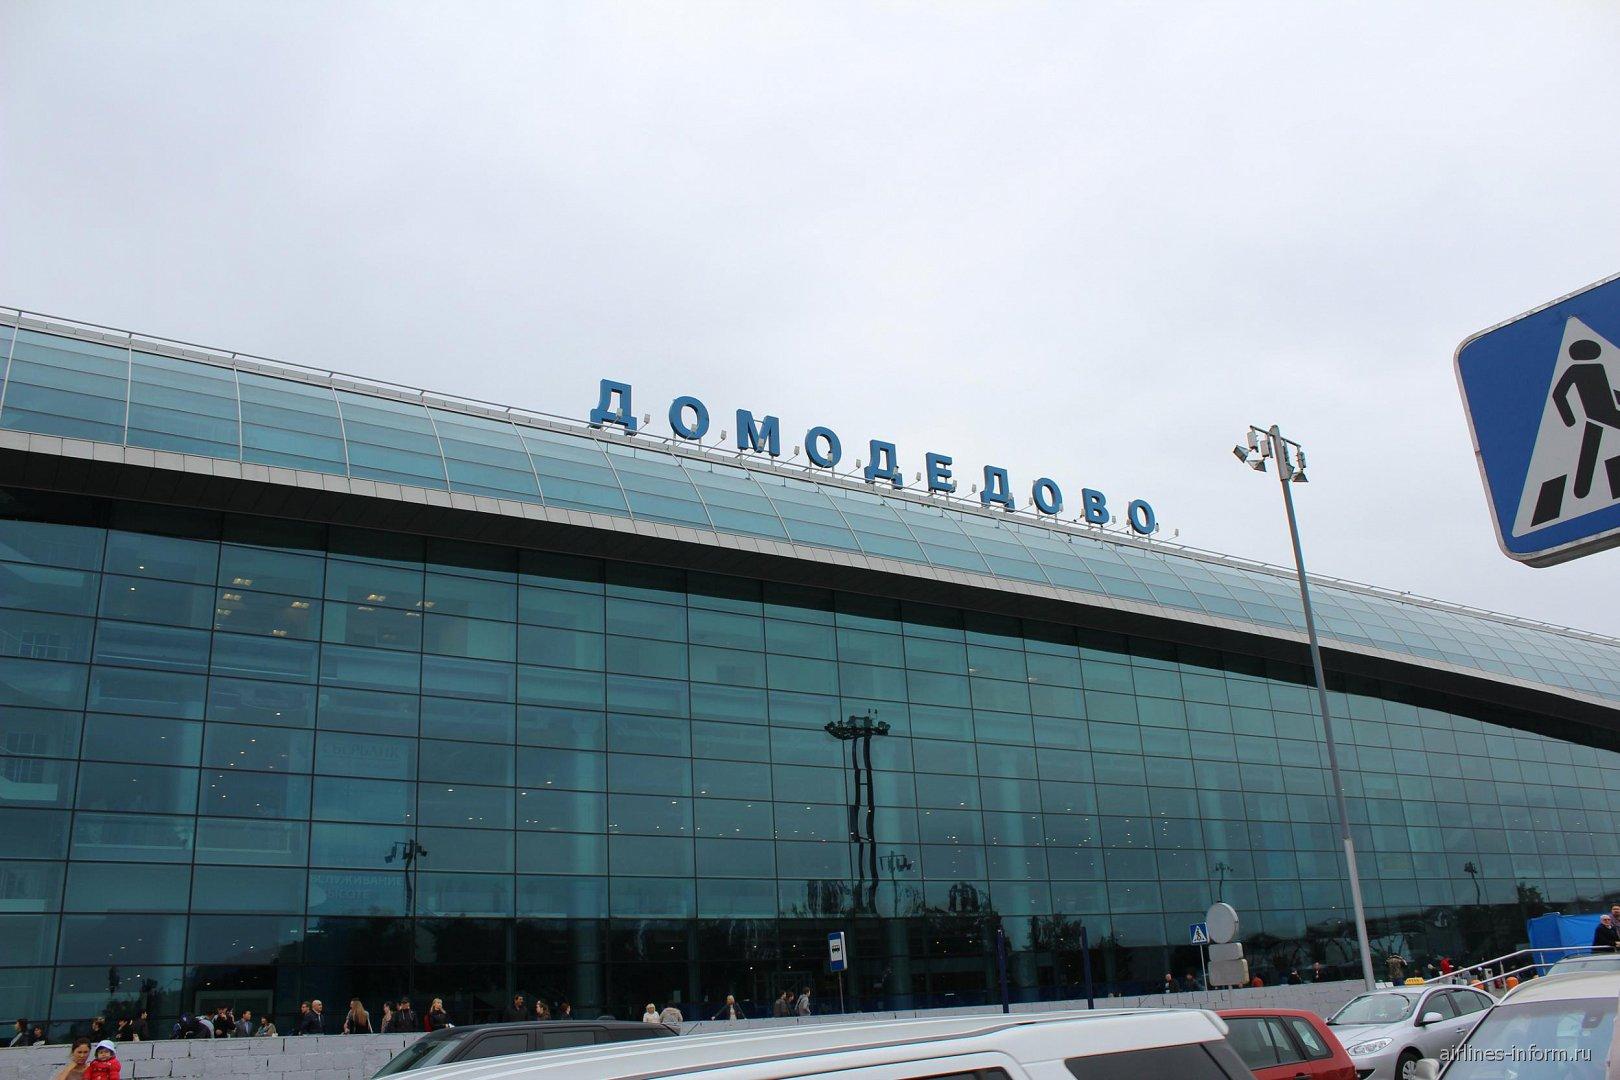 Аэровокзал аэропорта Домодедово